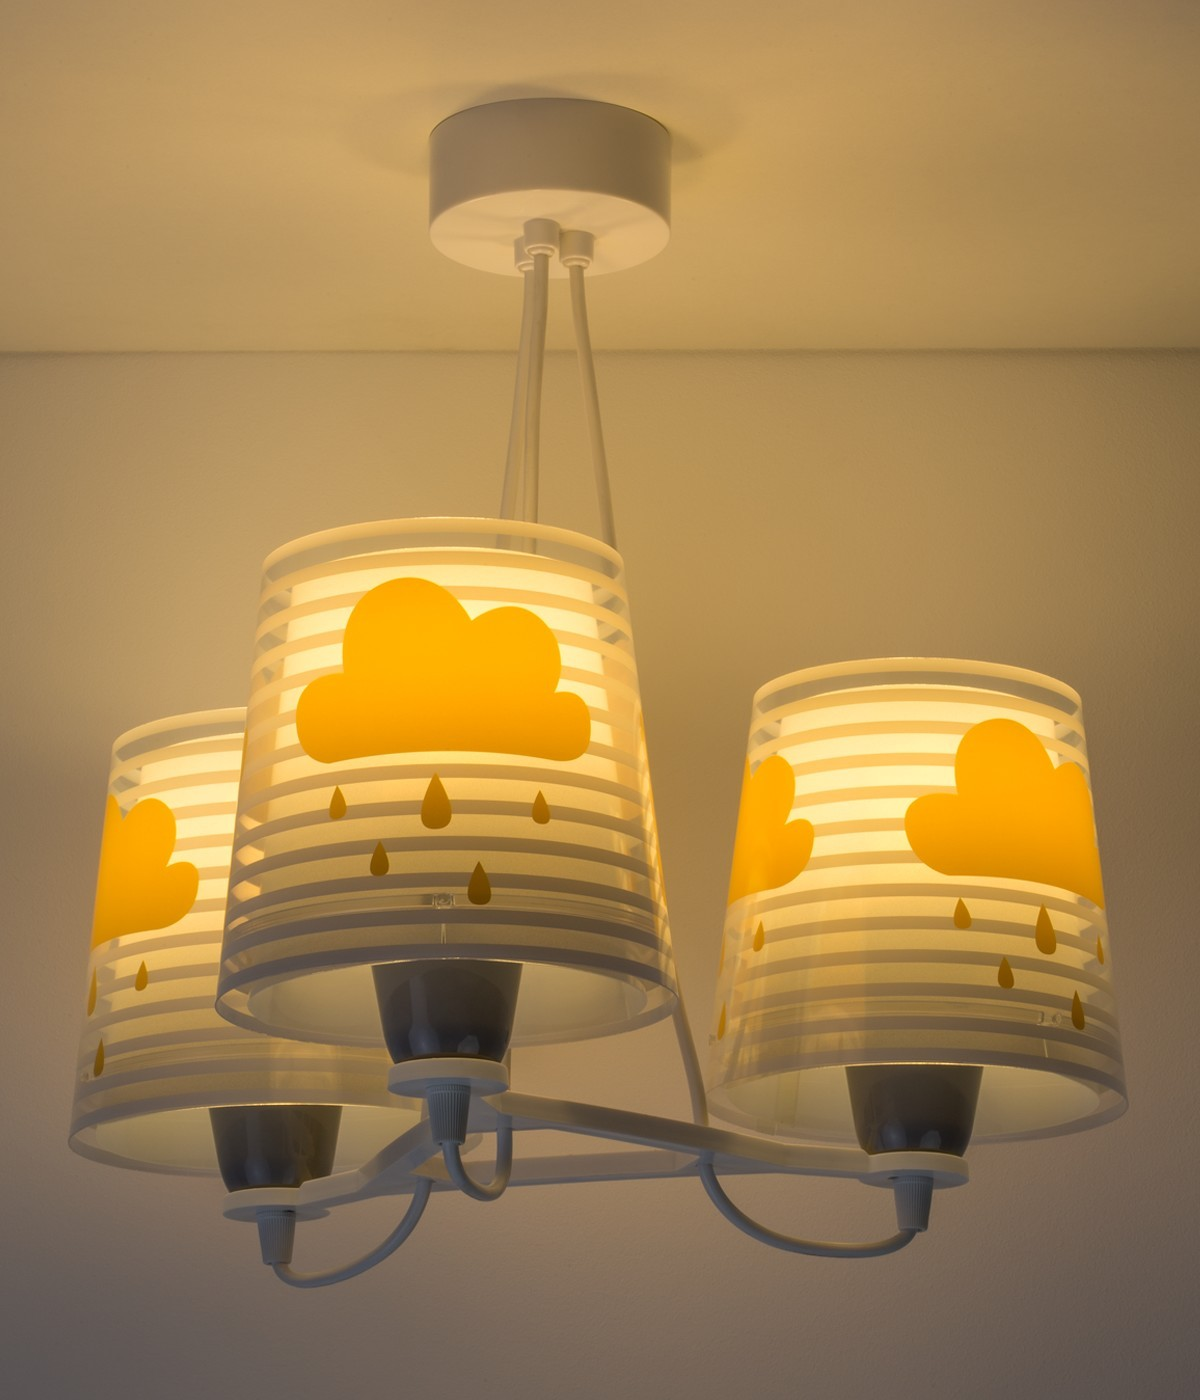 Candeeiro infantil de tecto três luzes Light Feeling cinza